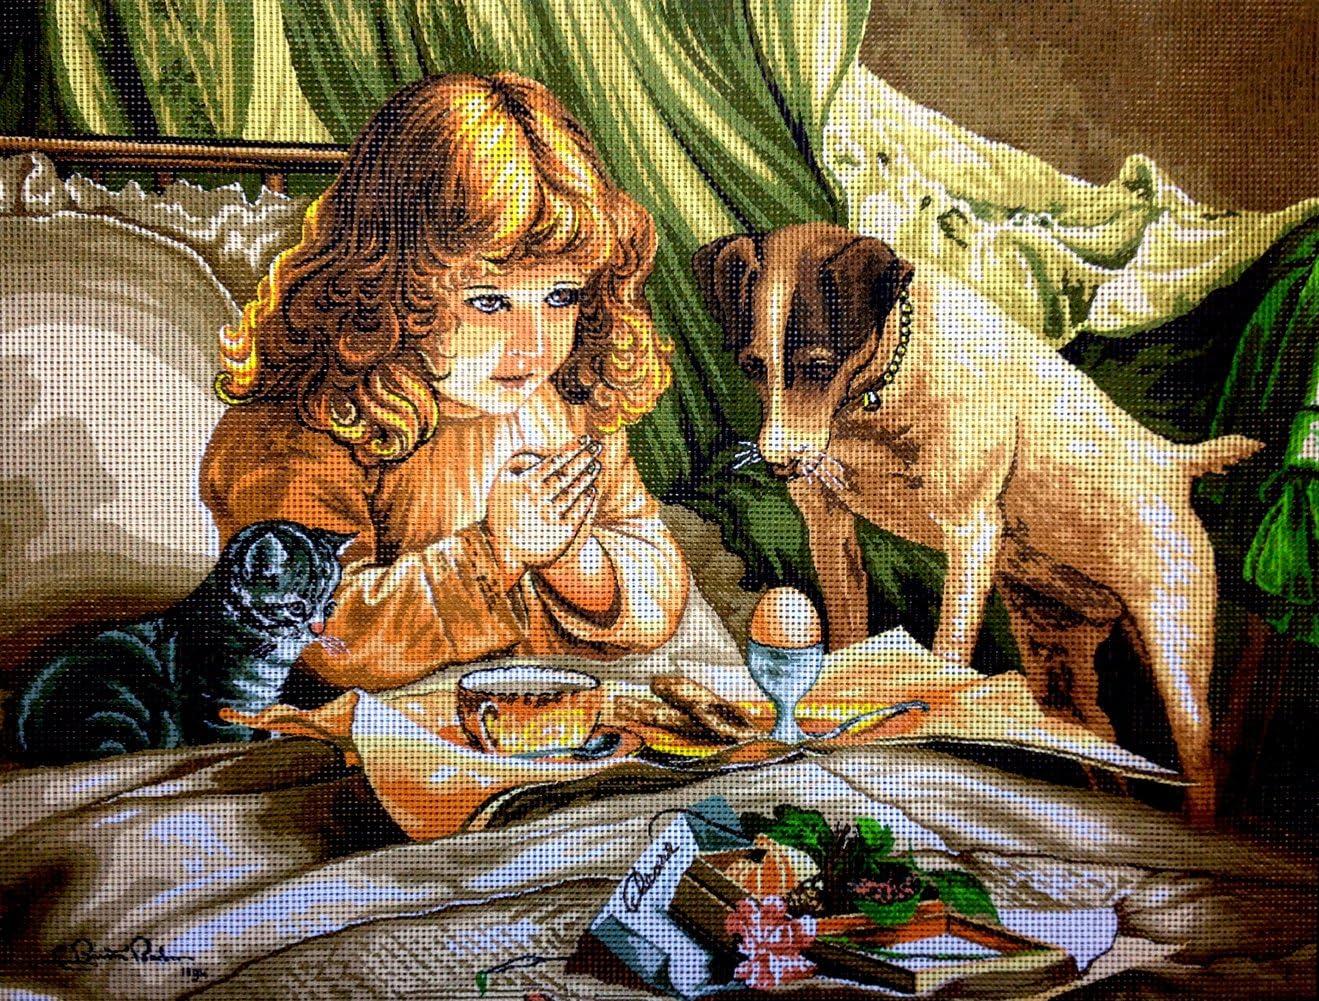 hudemas Needlepoint Kit Breakfast 15.7x11.8 40x30cm Printed Canvas 275